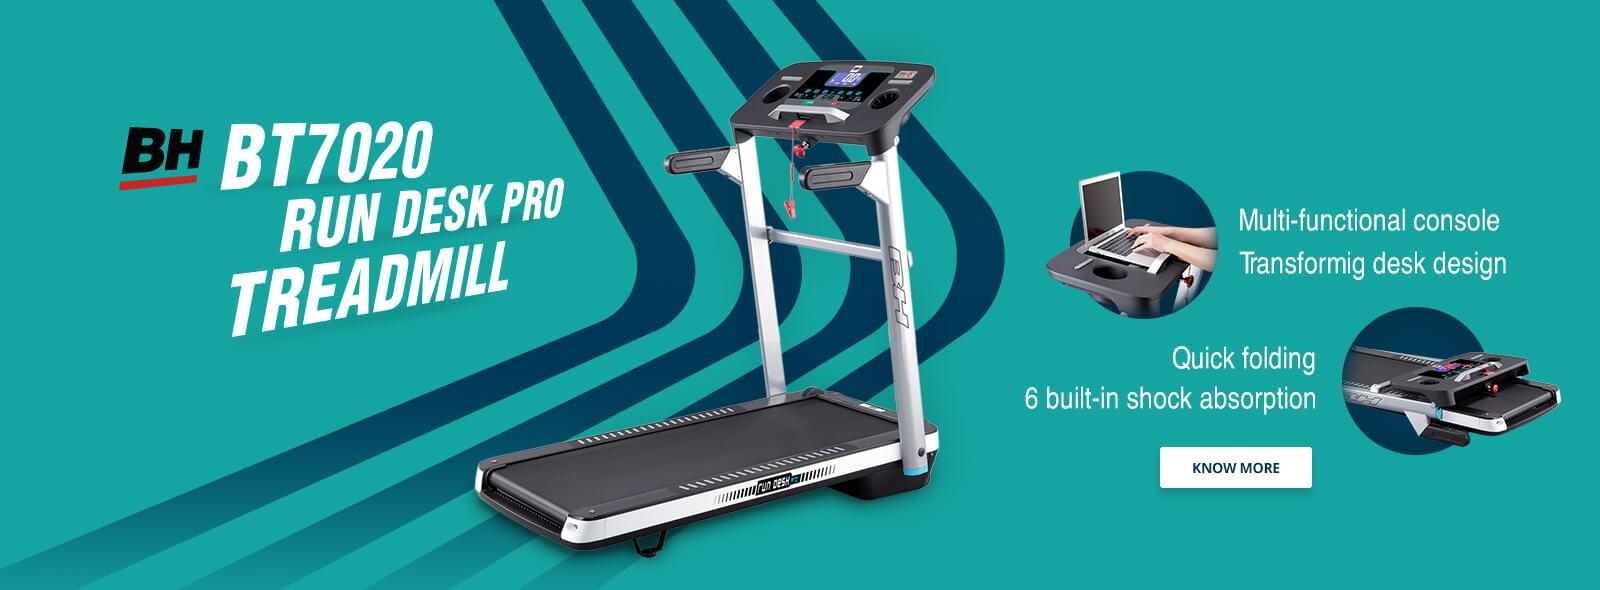 Buy Fitness Equipment Online India | Treadmills